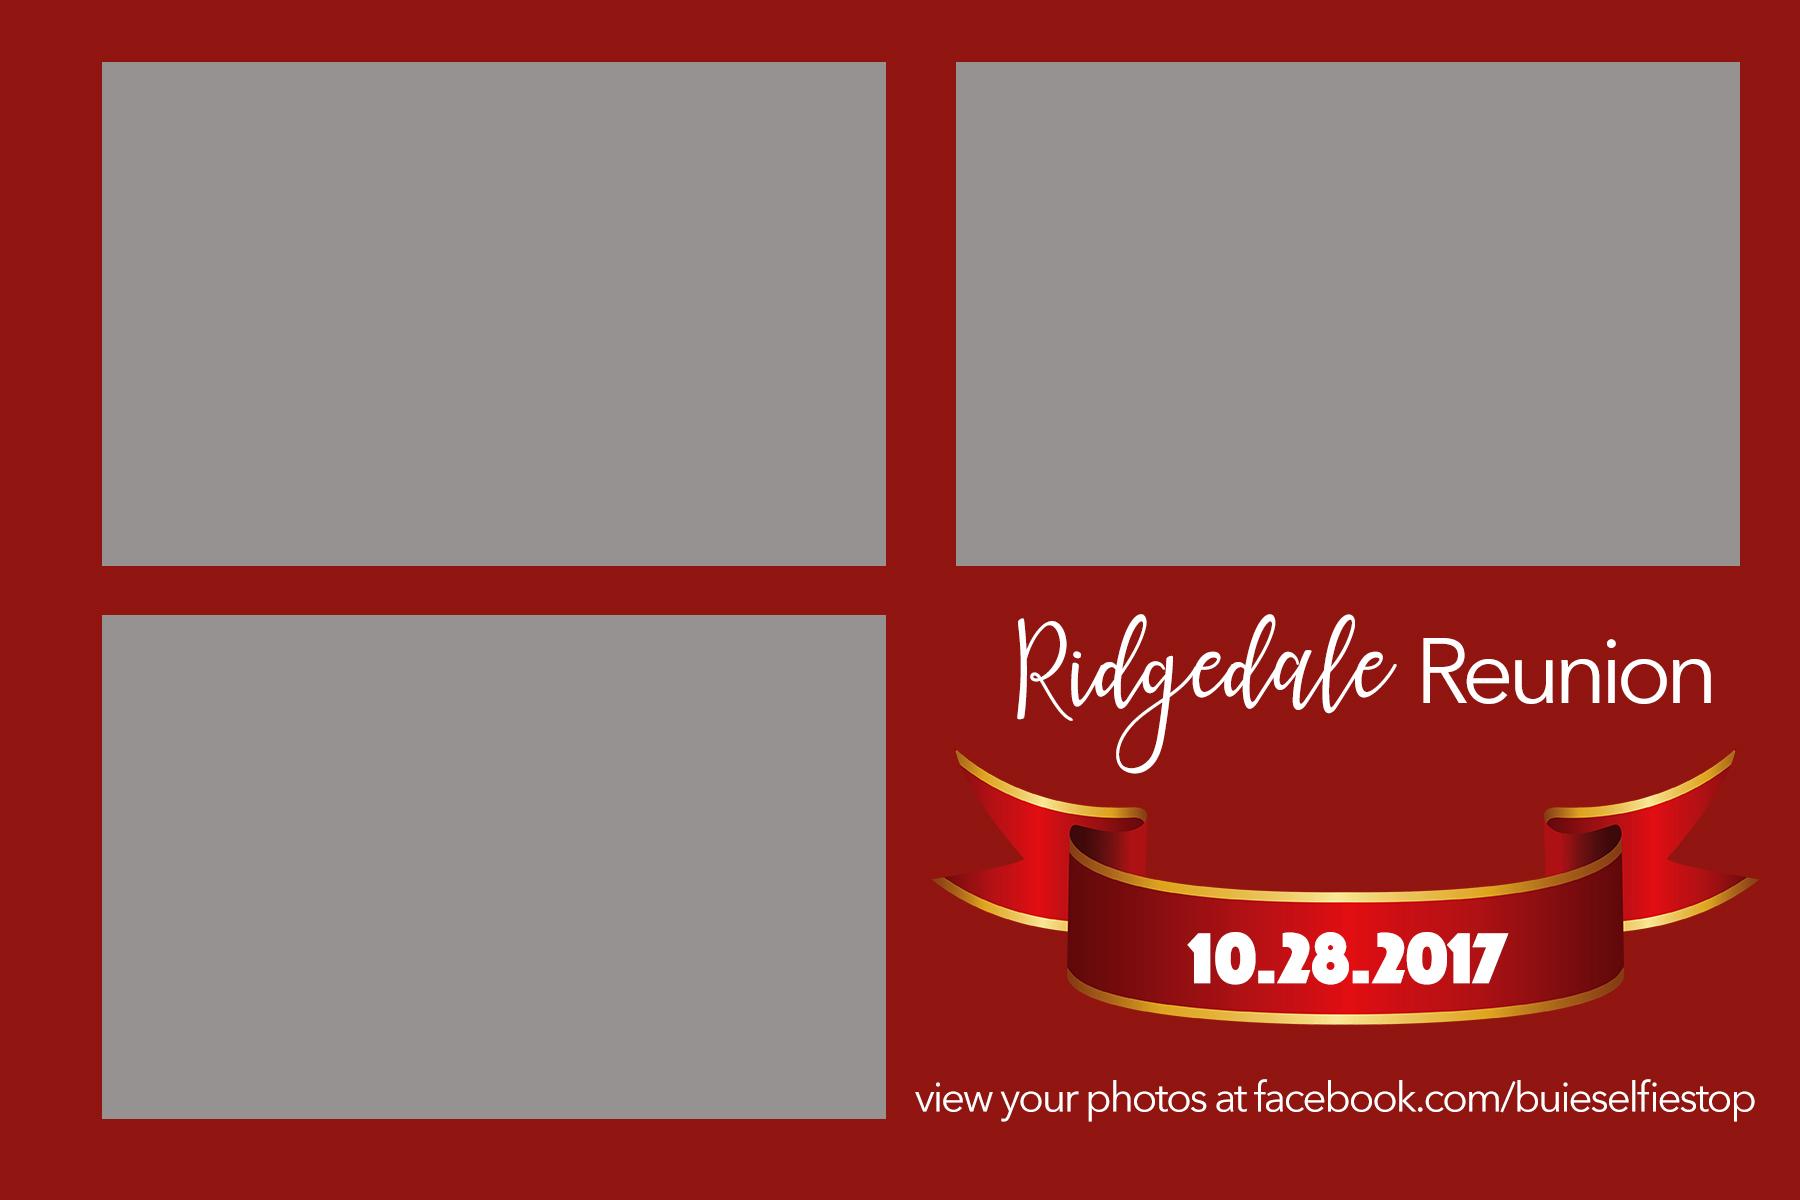 Ridgedale Reunion.jpg